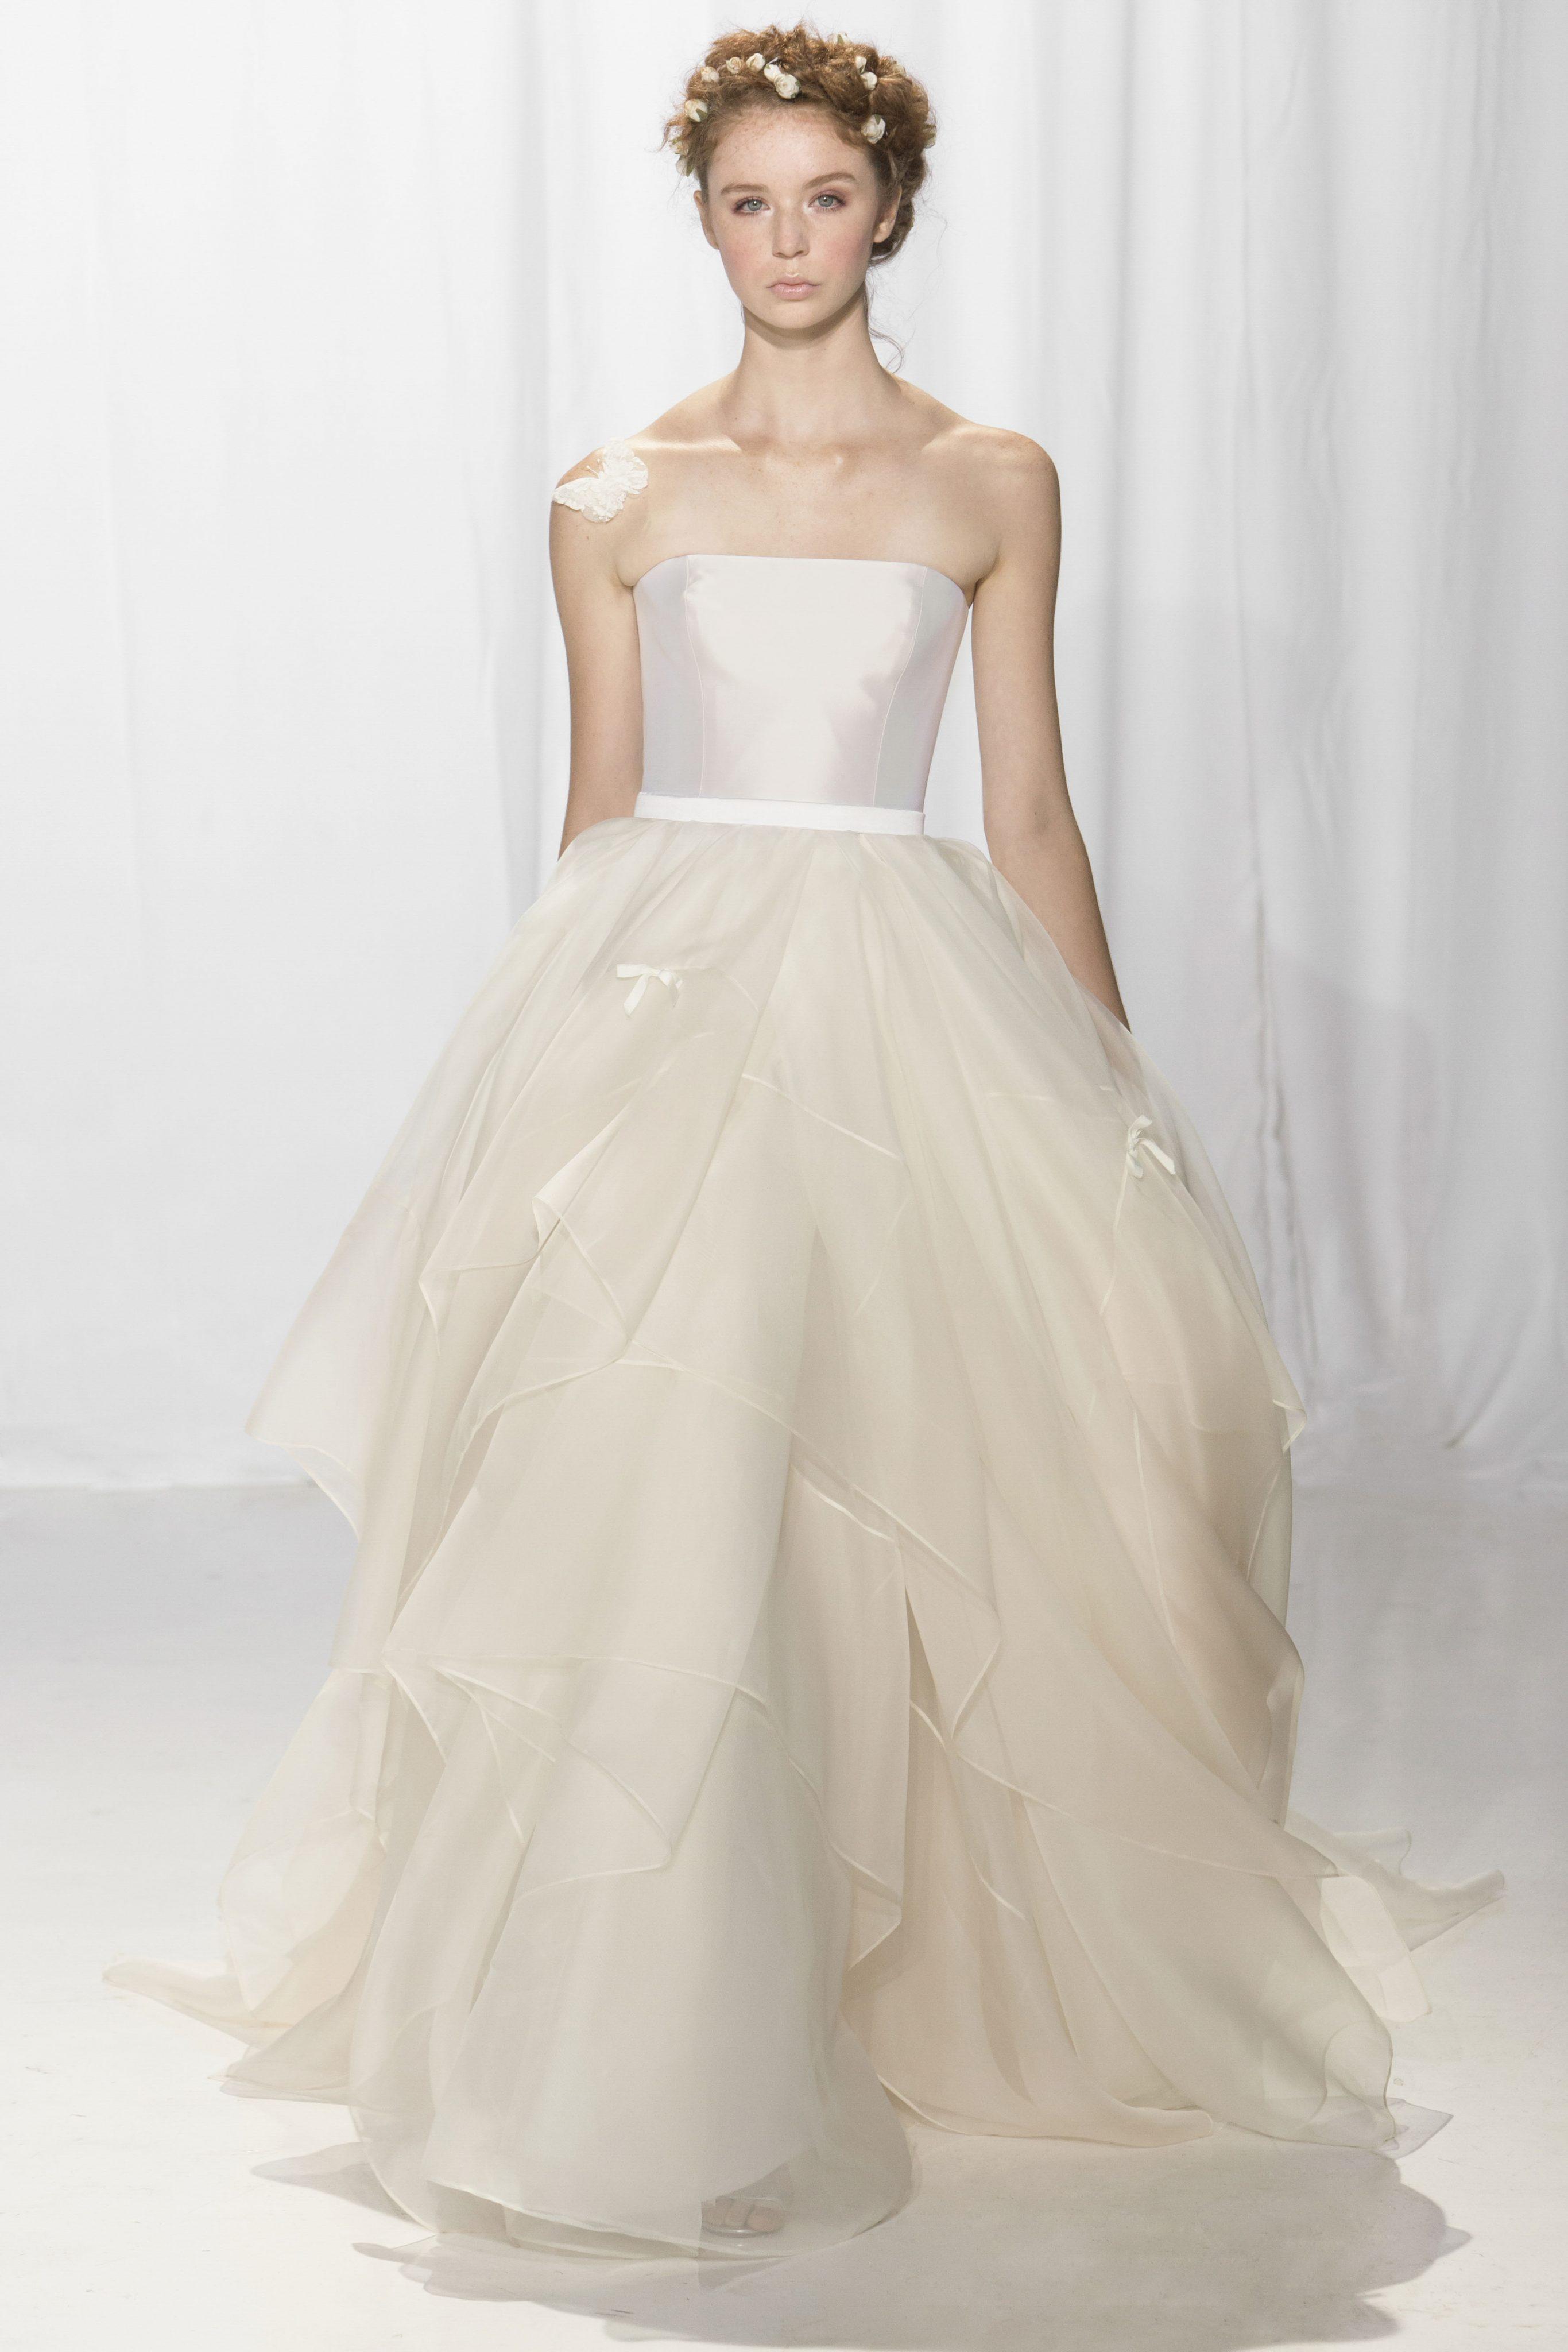 Classic Ball Gown Wedding Dress | Kleinfeld Bridal